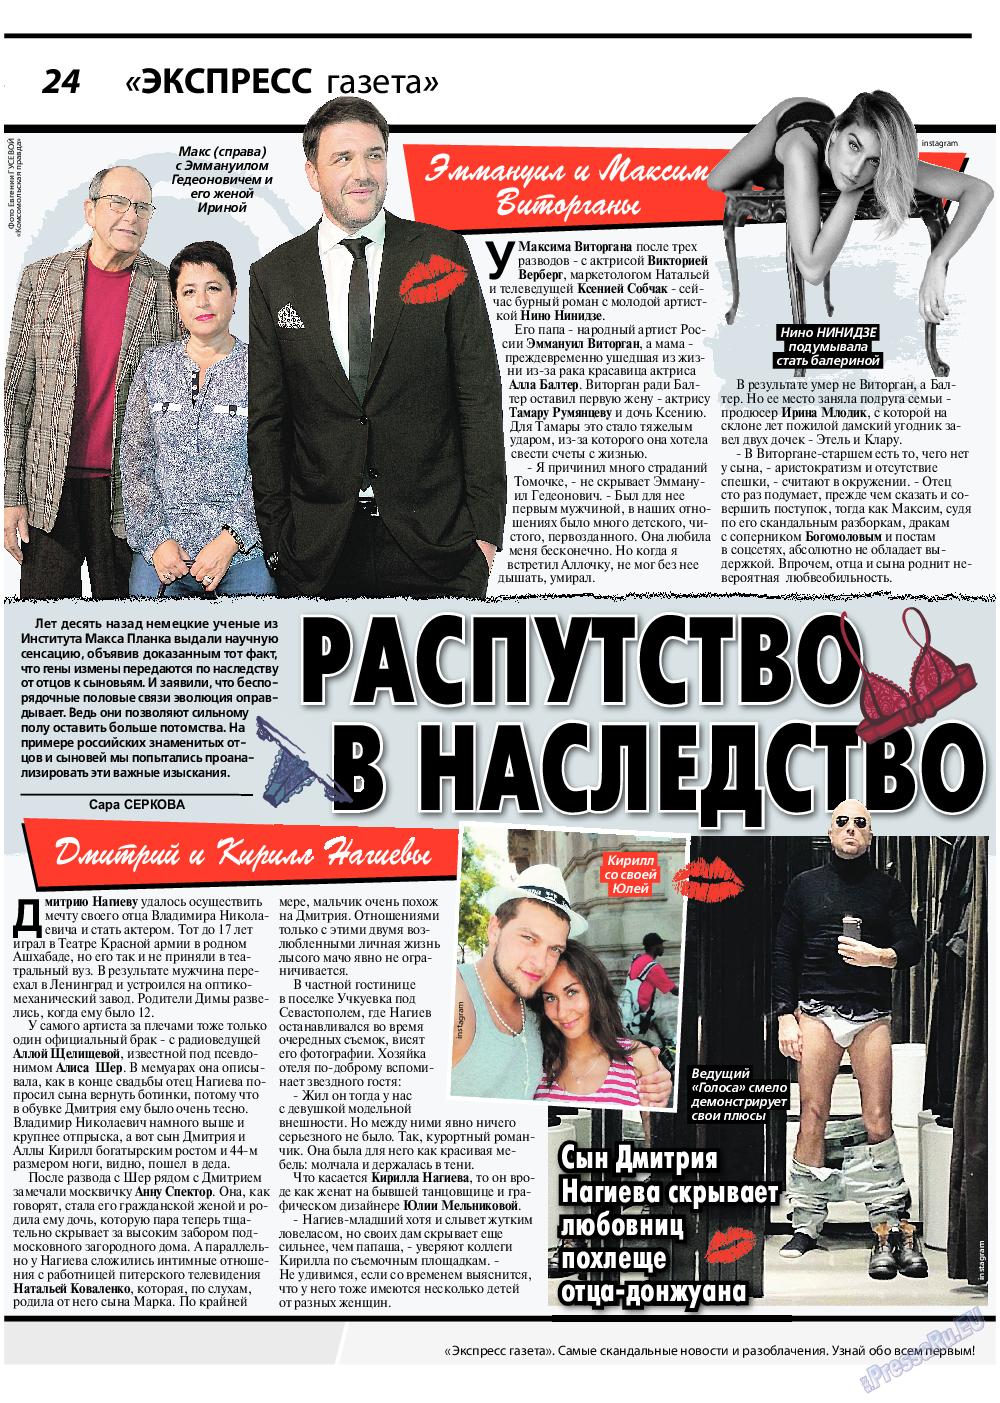 Экспресс газета (газета). 2020 год, номер 4, стр. 24